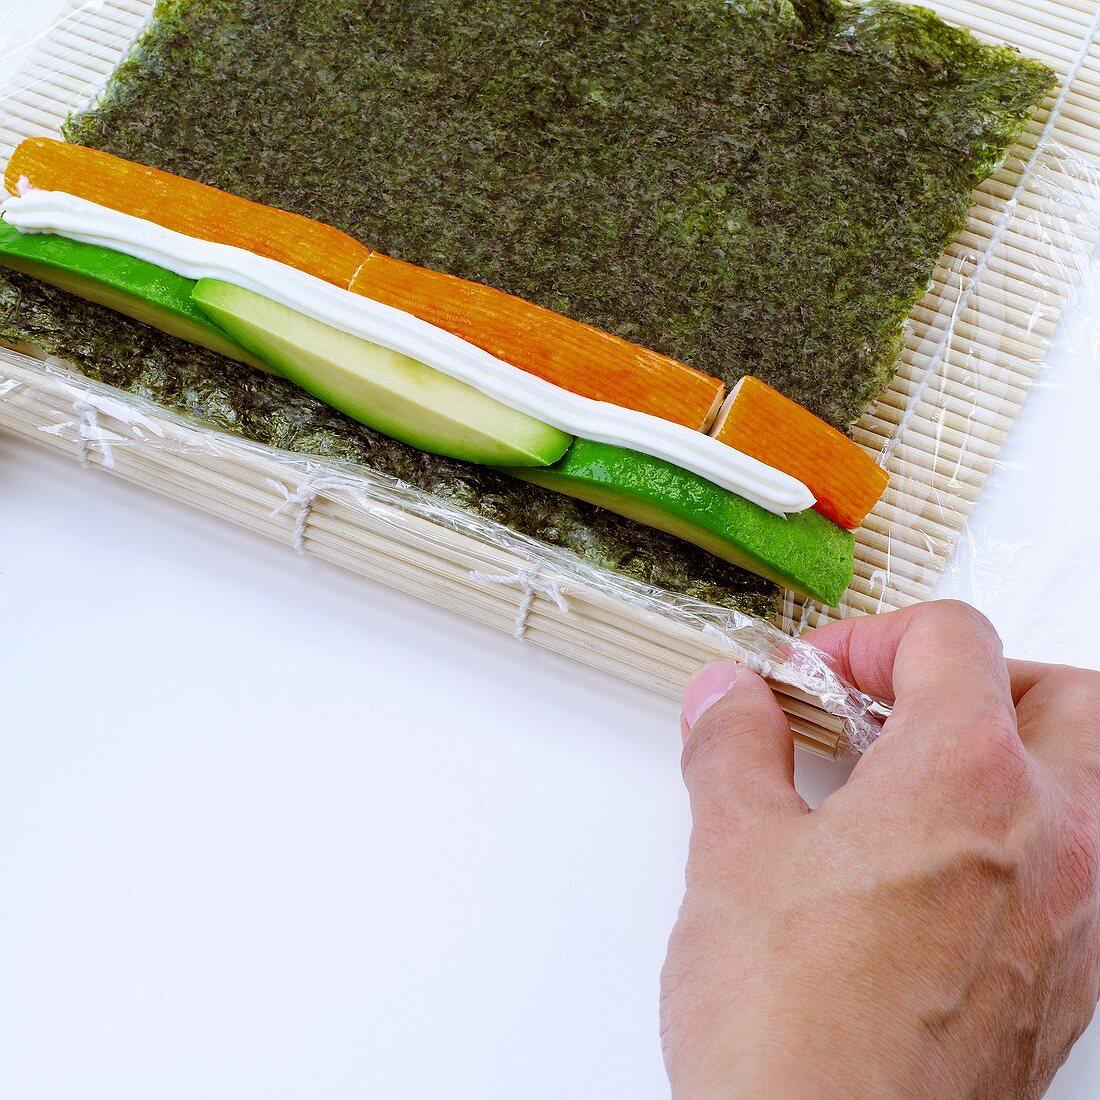 Making California rolls (rolling up bamboo mat)